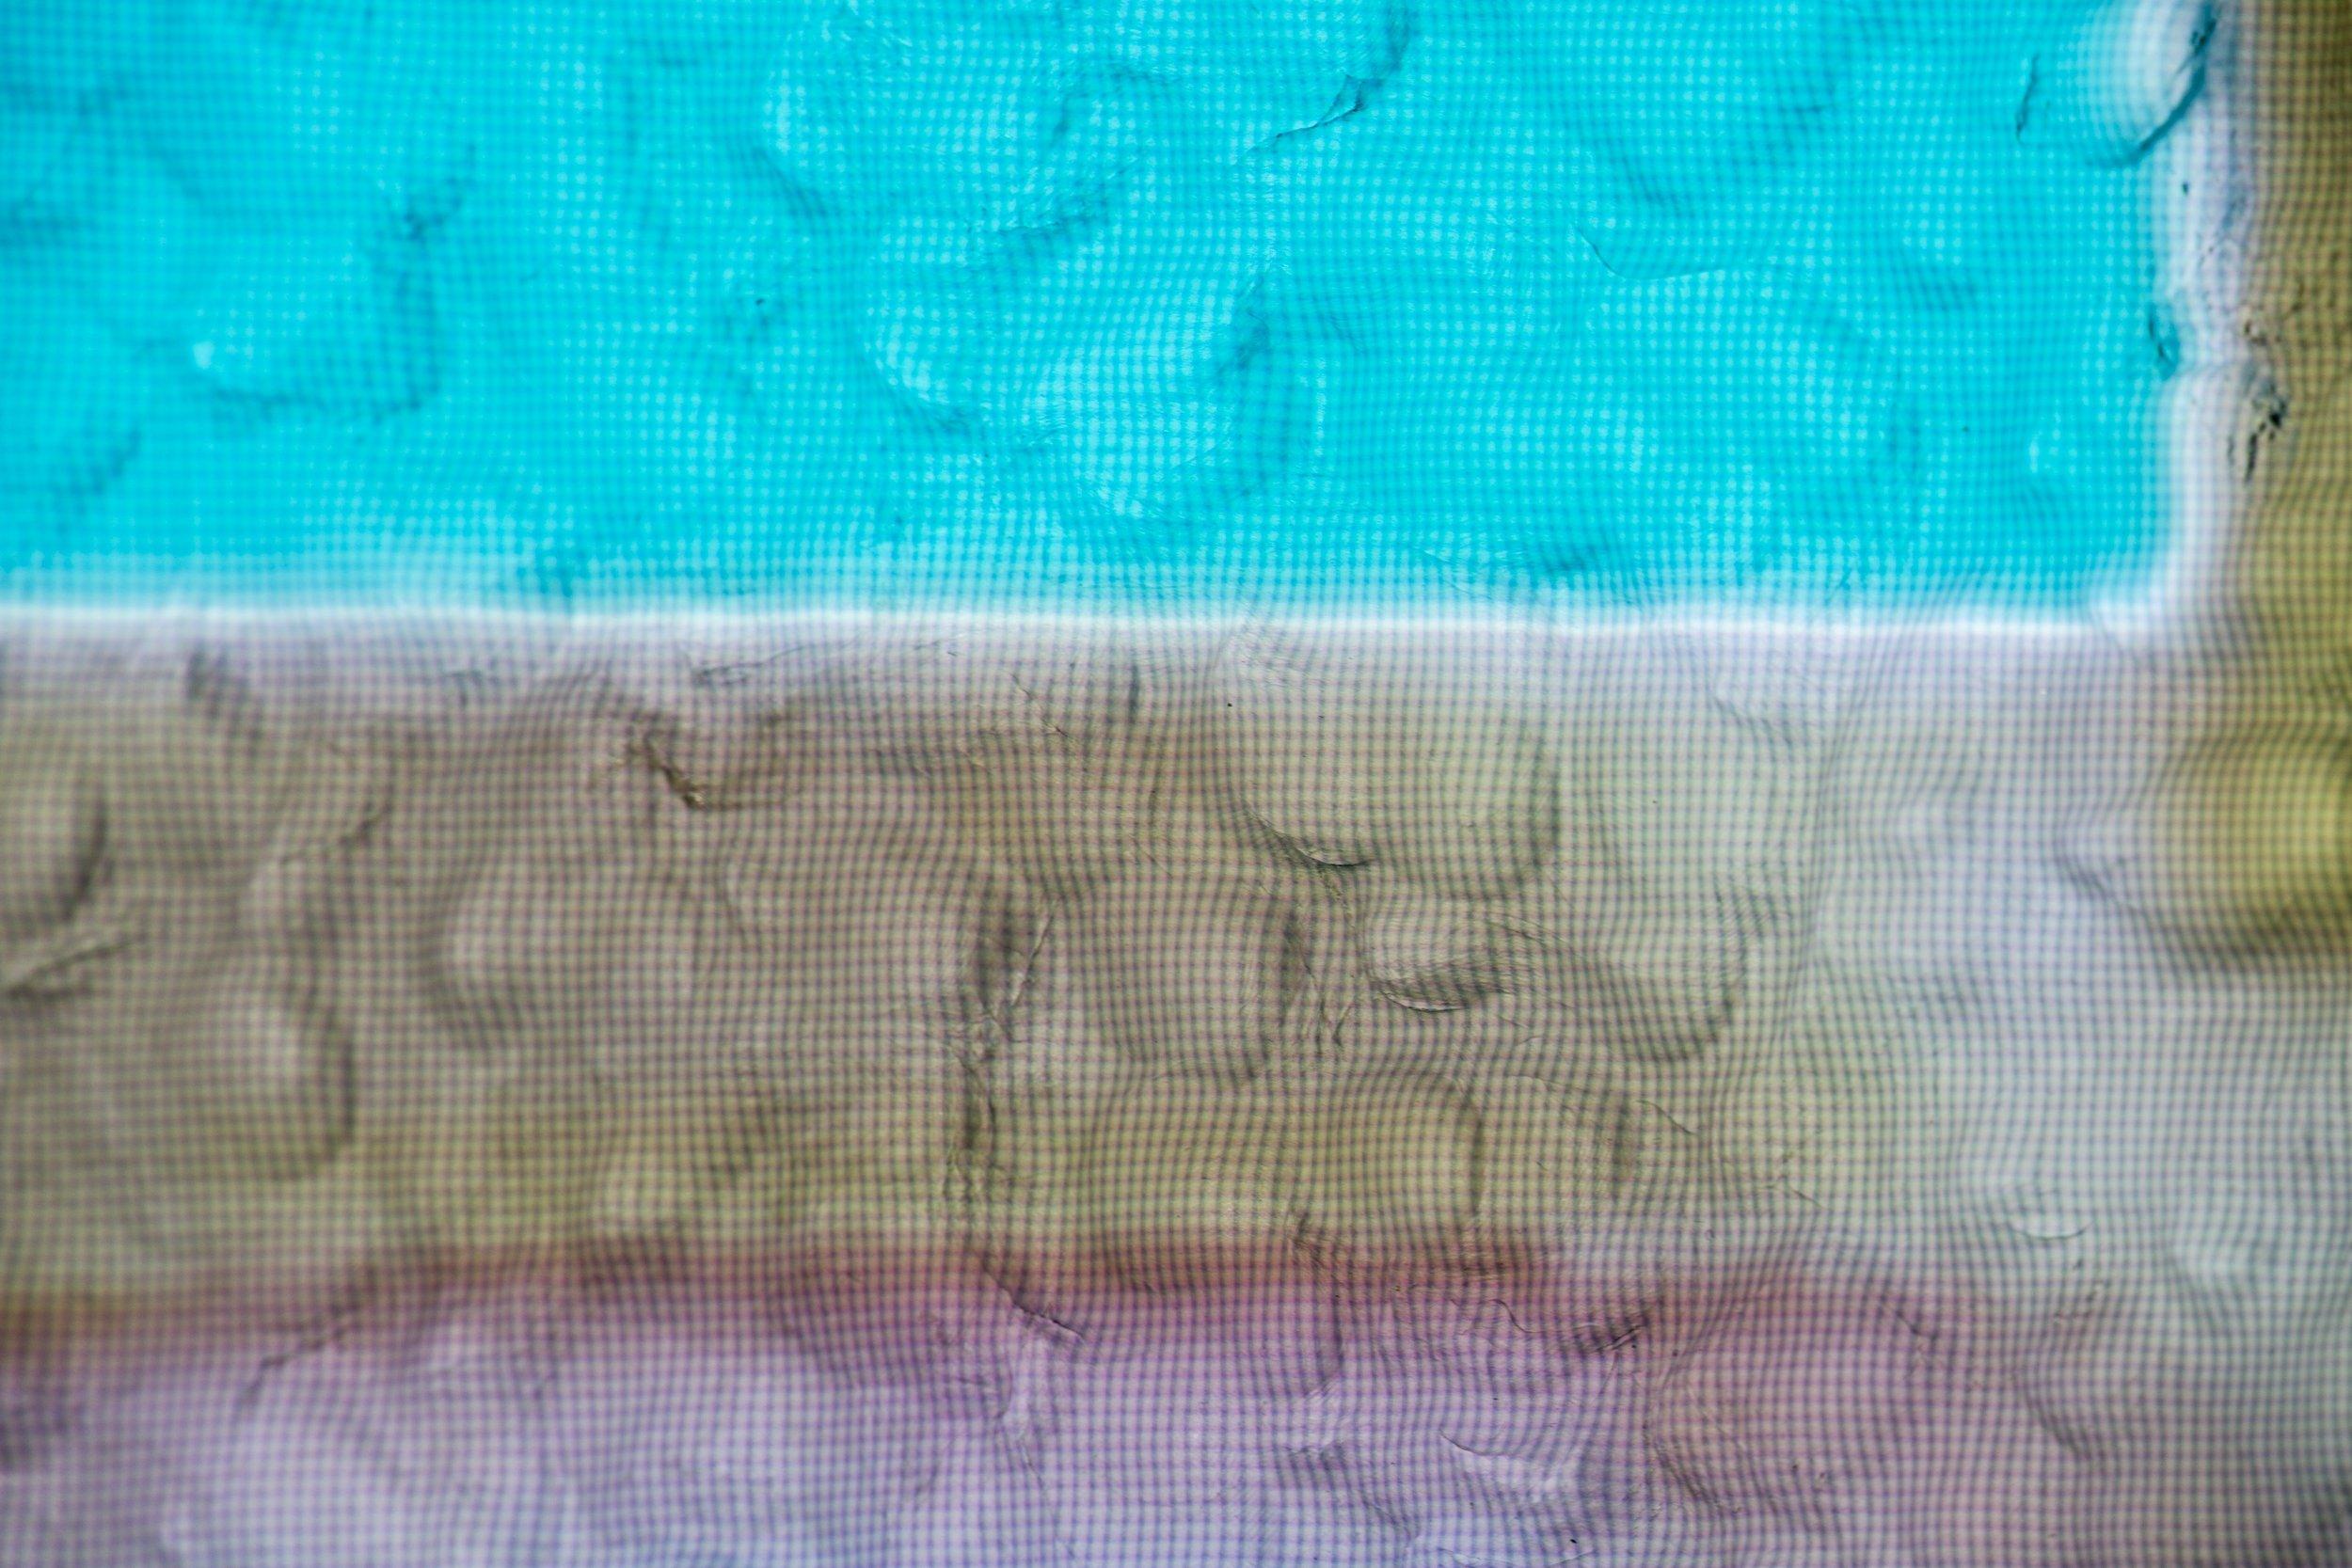 Odum_HorizonLines_Detail3.jpg